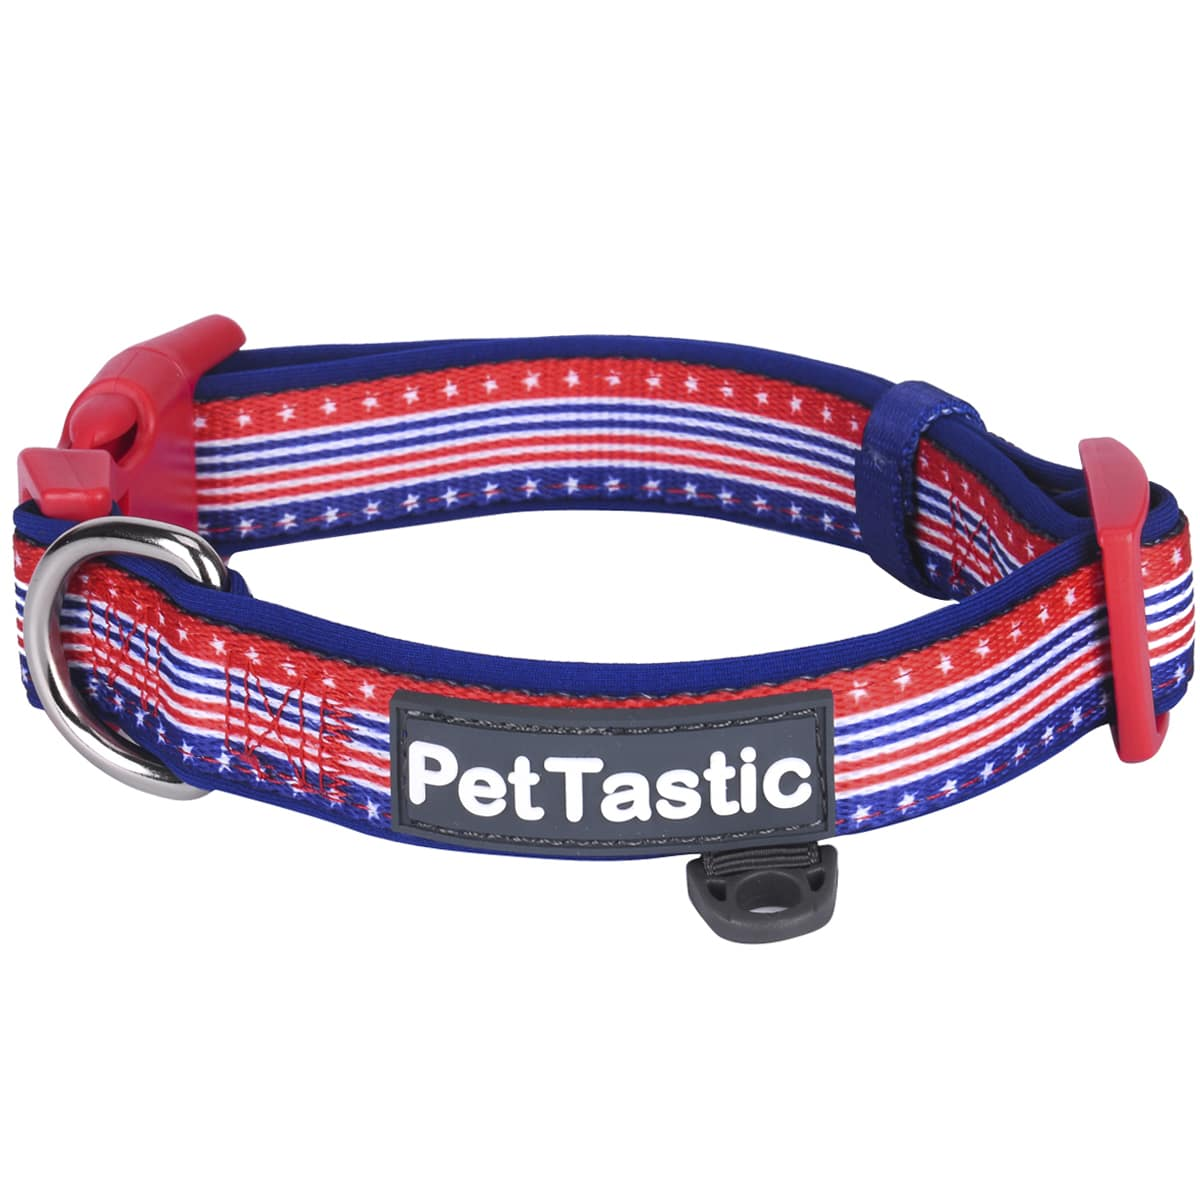 God Bless America Dog Collar